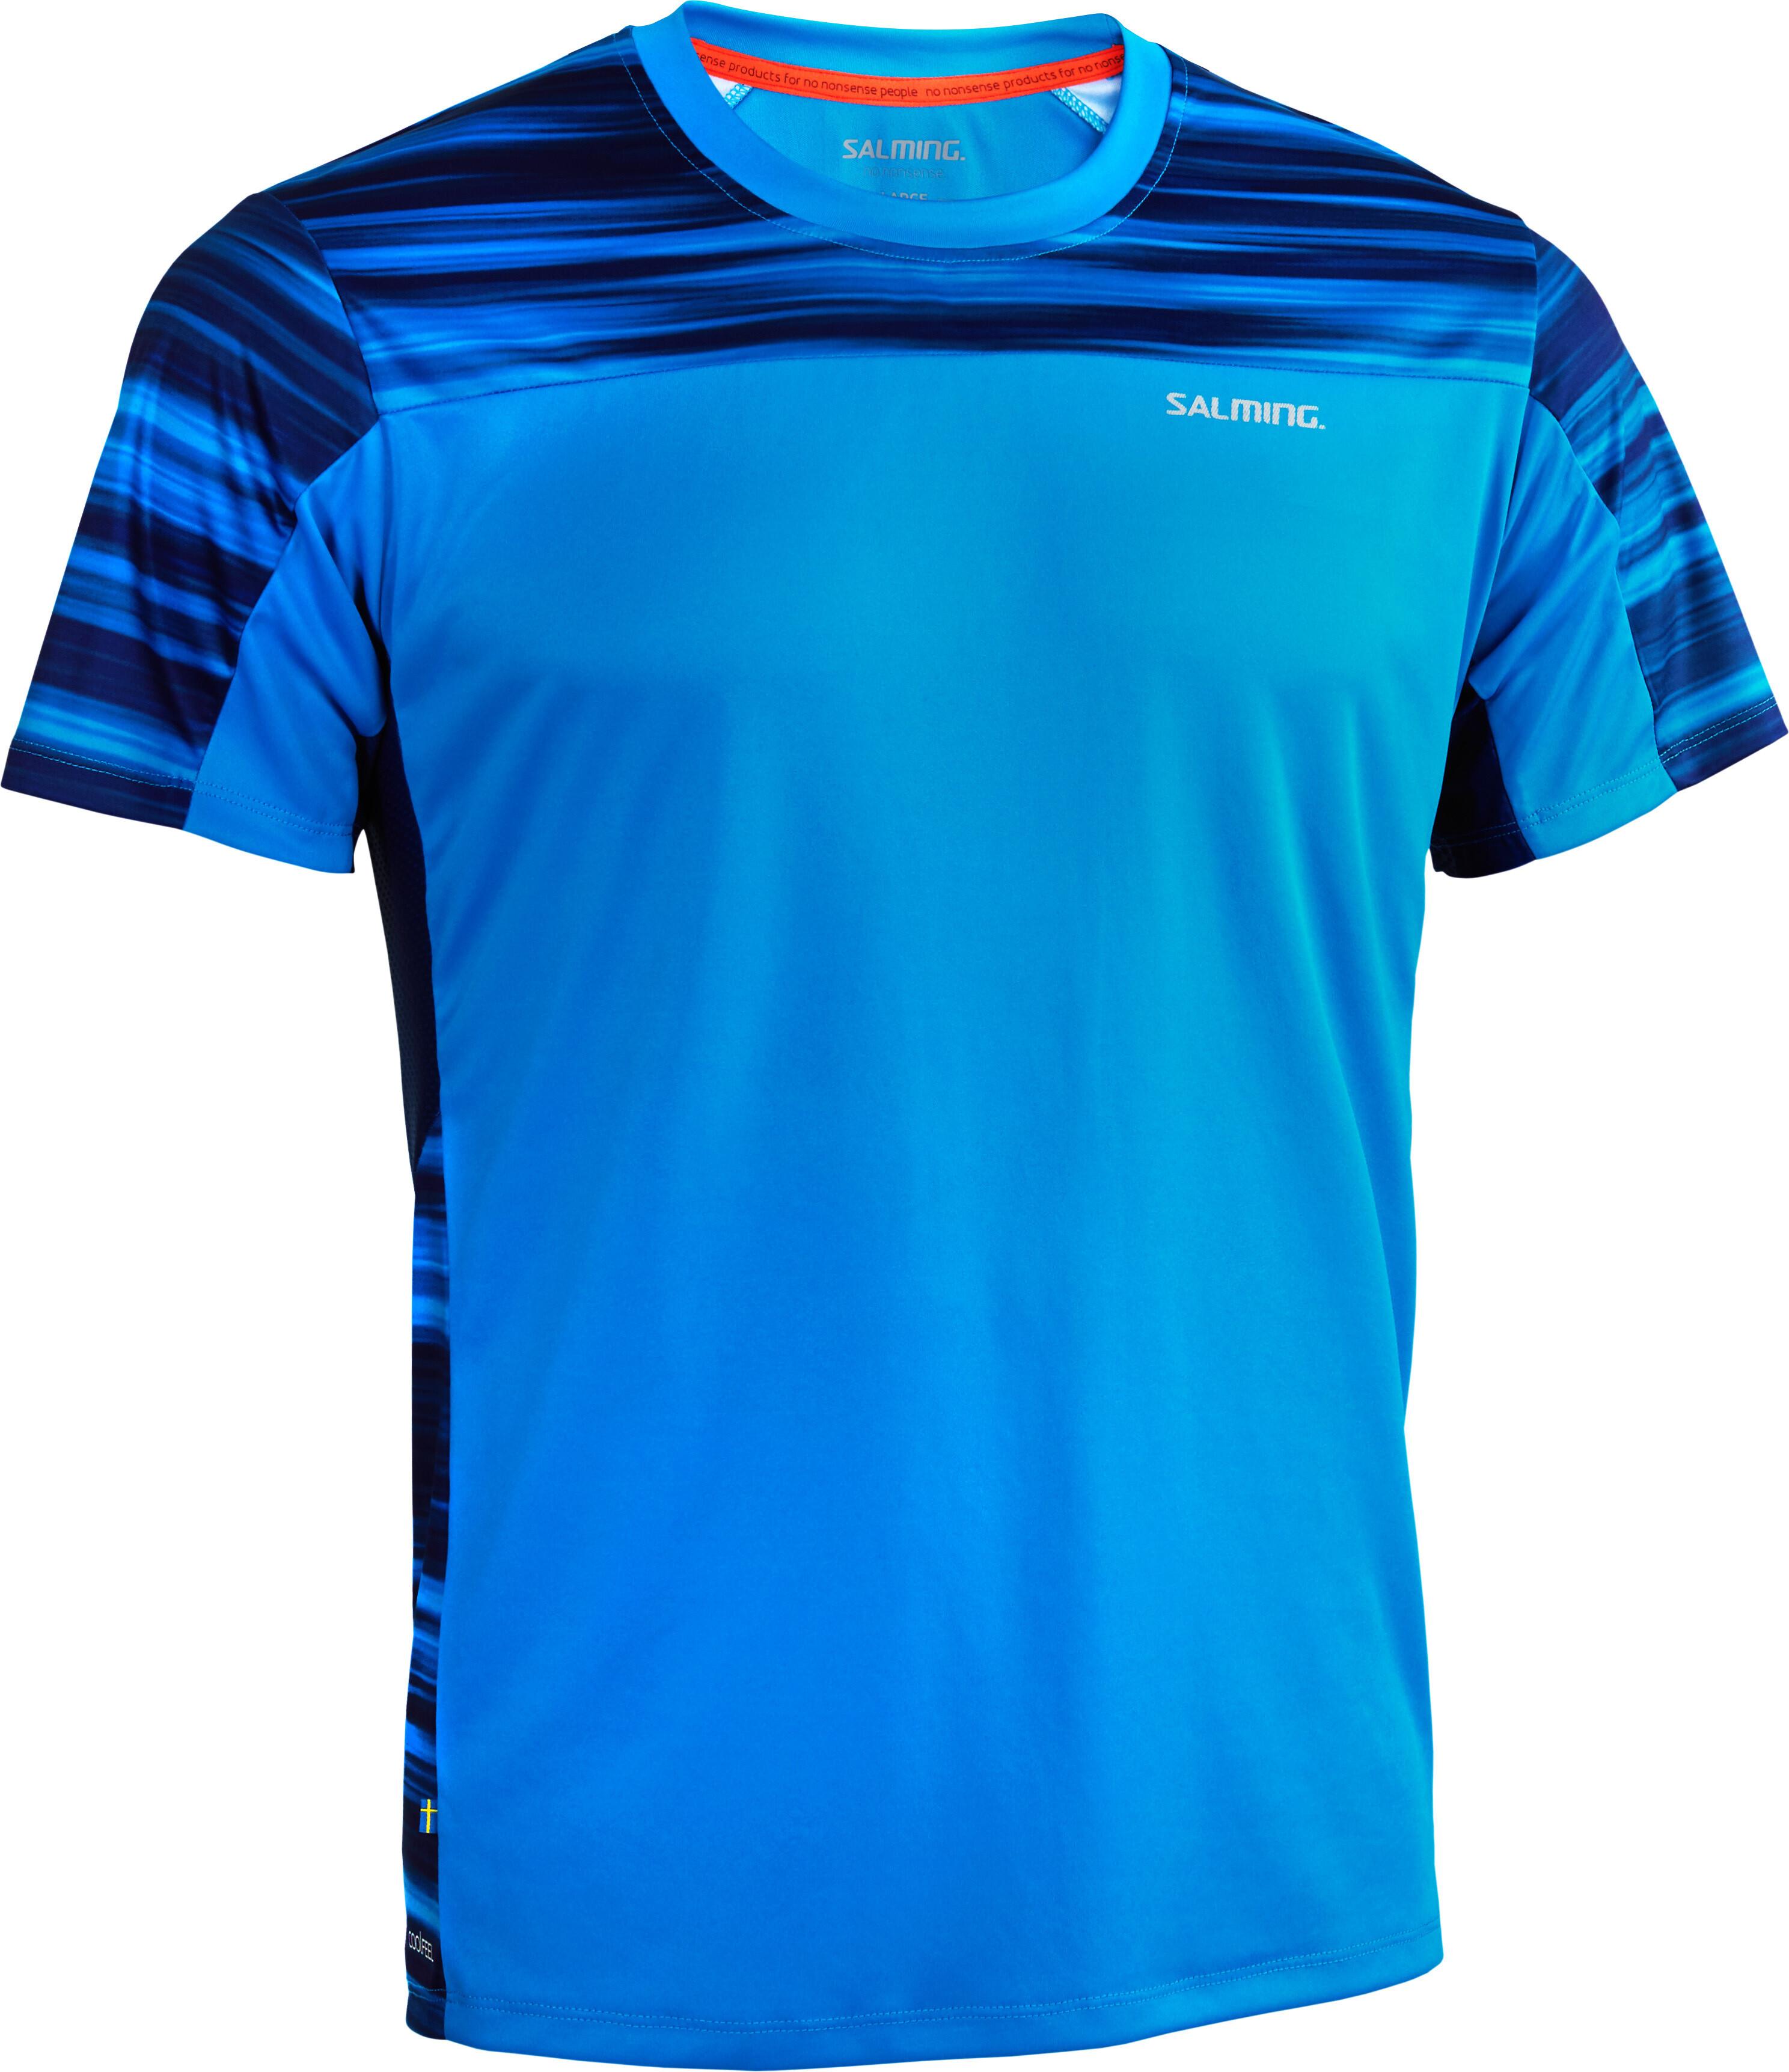 factory outlets get cheap cheap for discount Salming Motion - T-shirt course à pied Homme - bleu